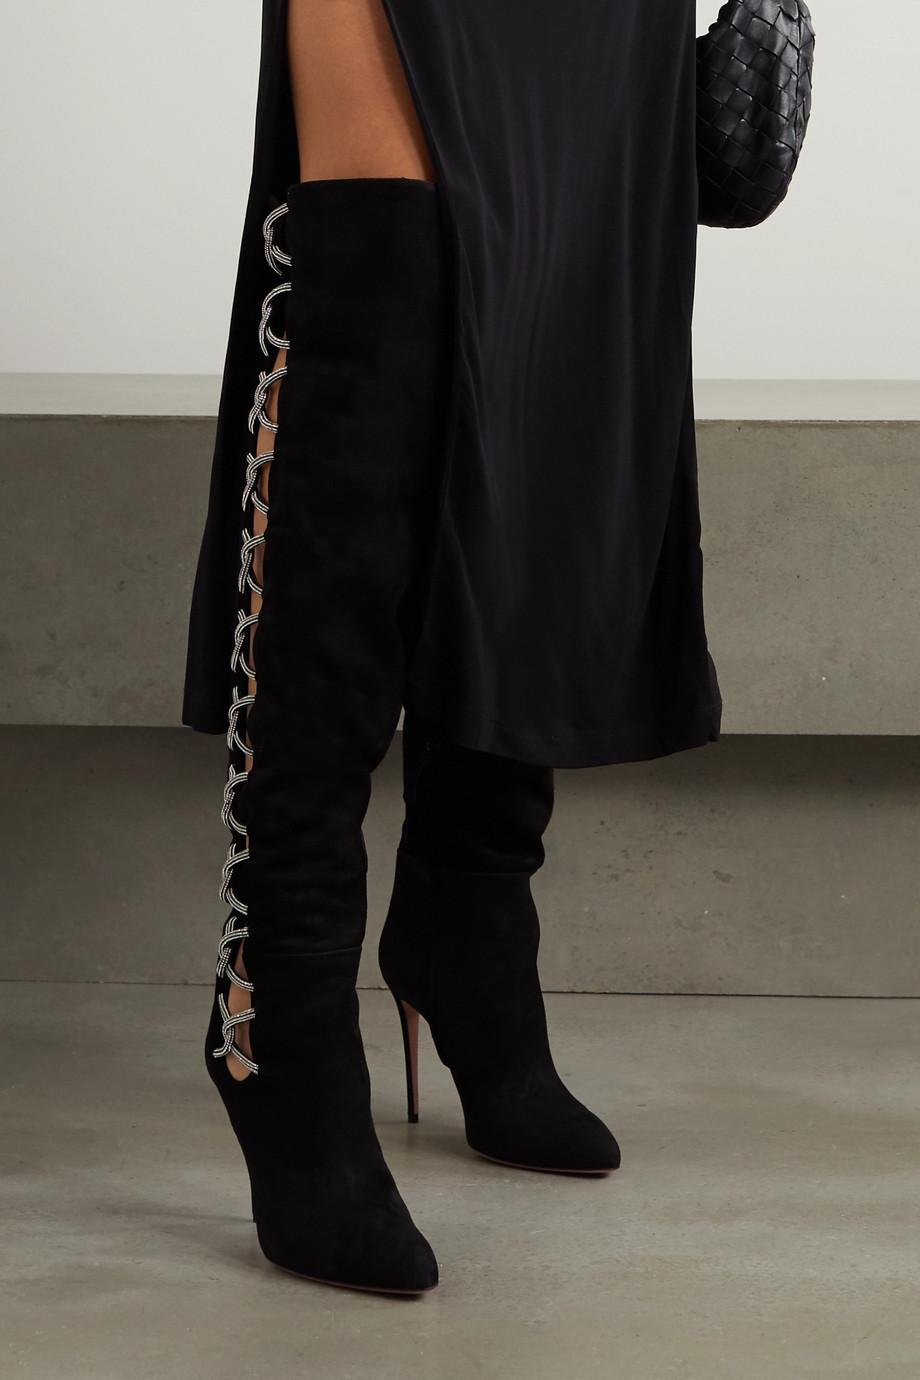 Aquazzura Belle De Nuit 105 cutout embellished suede over-the-knee boots